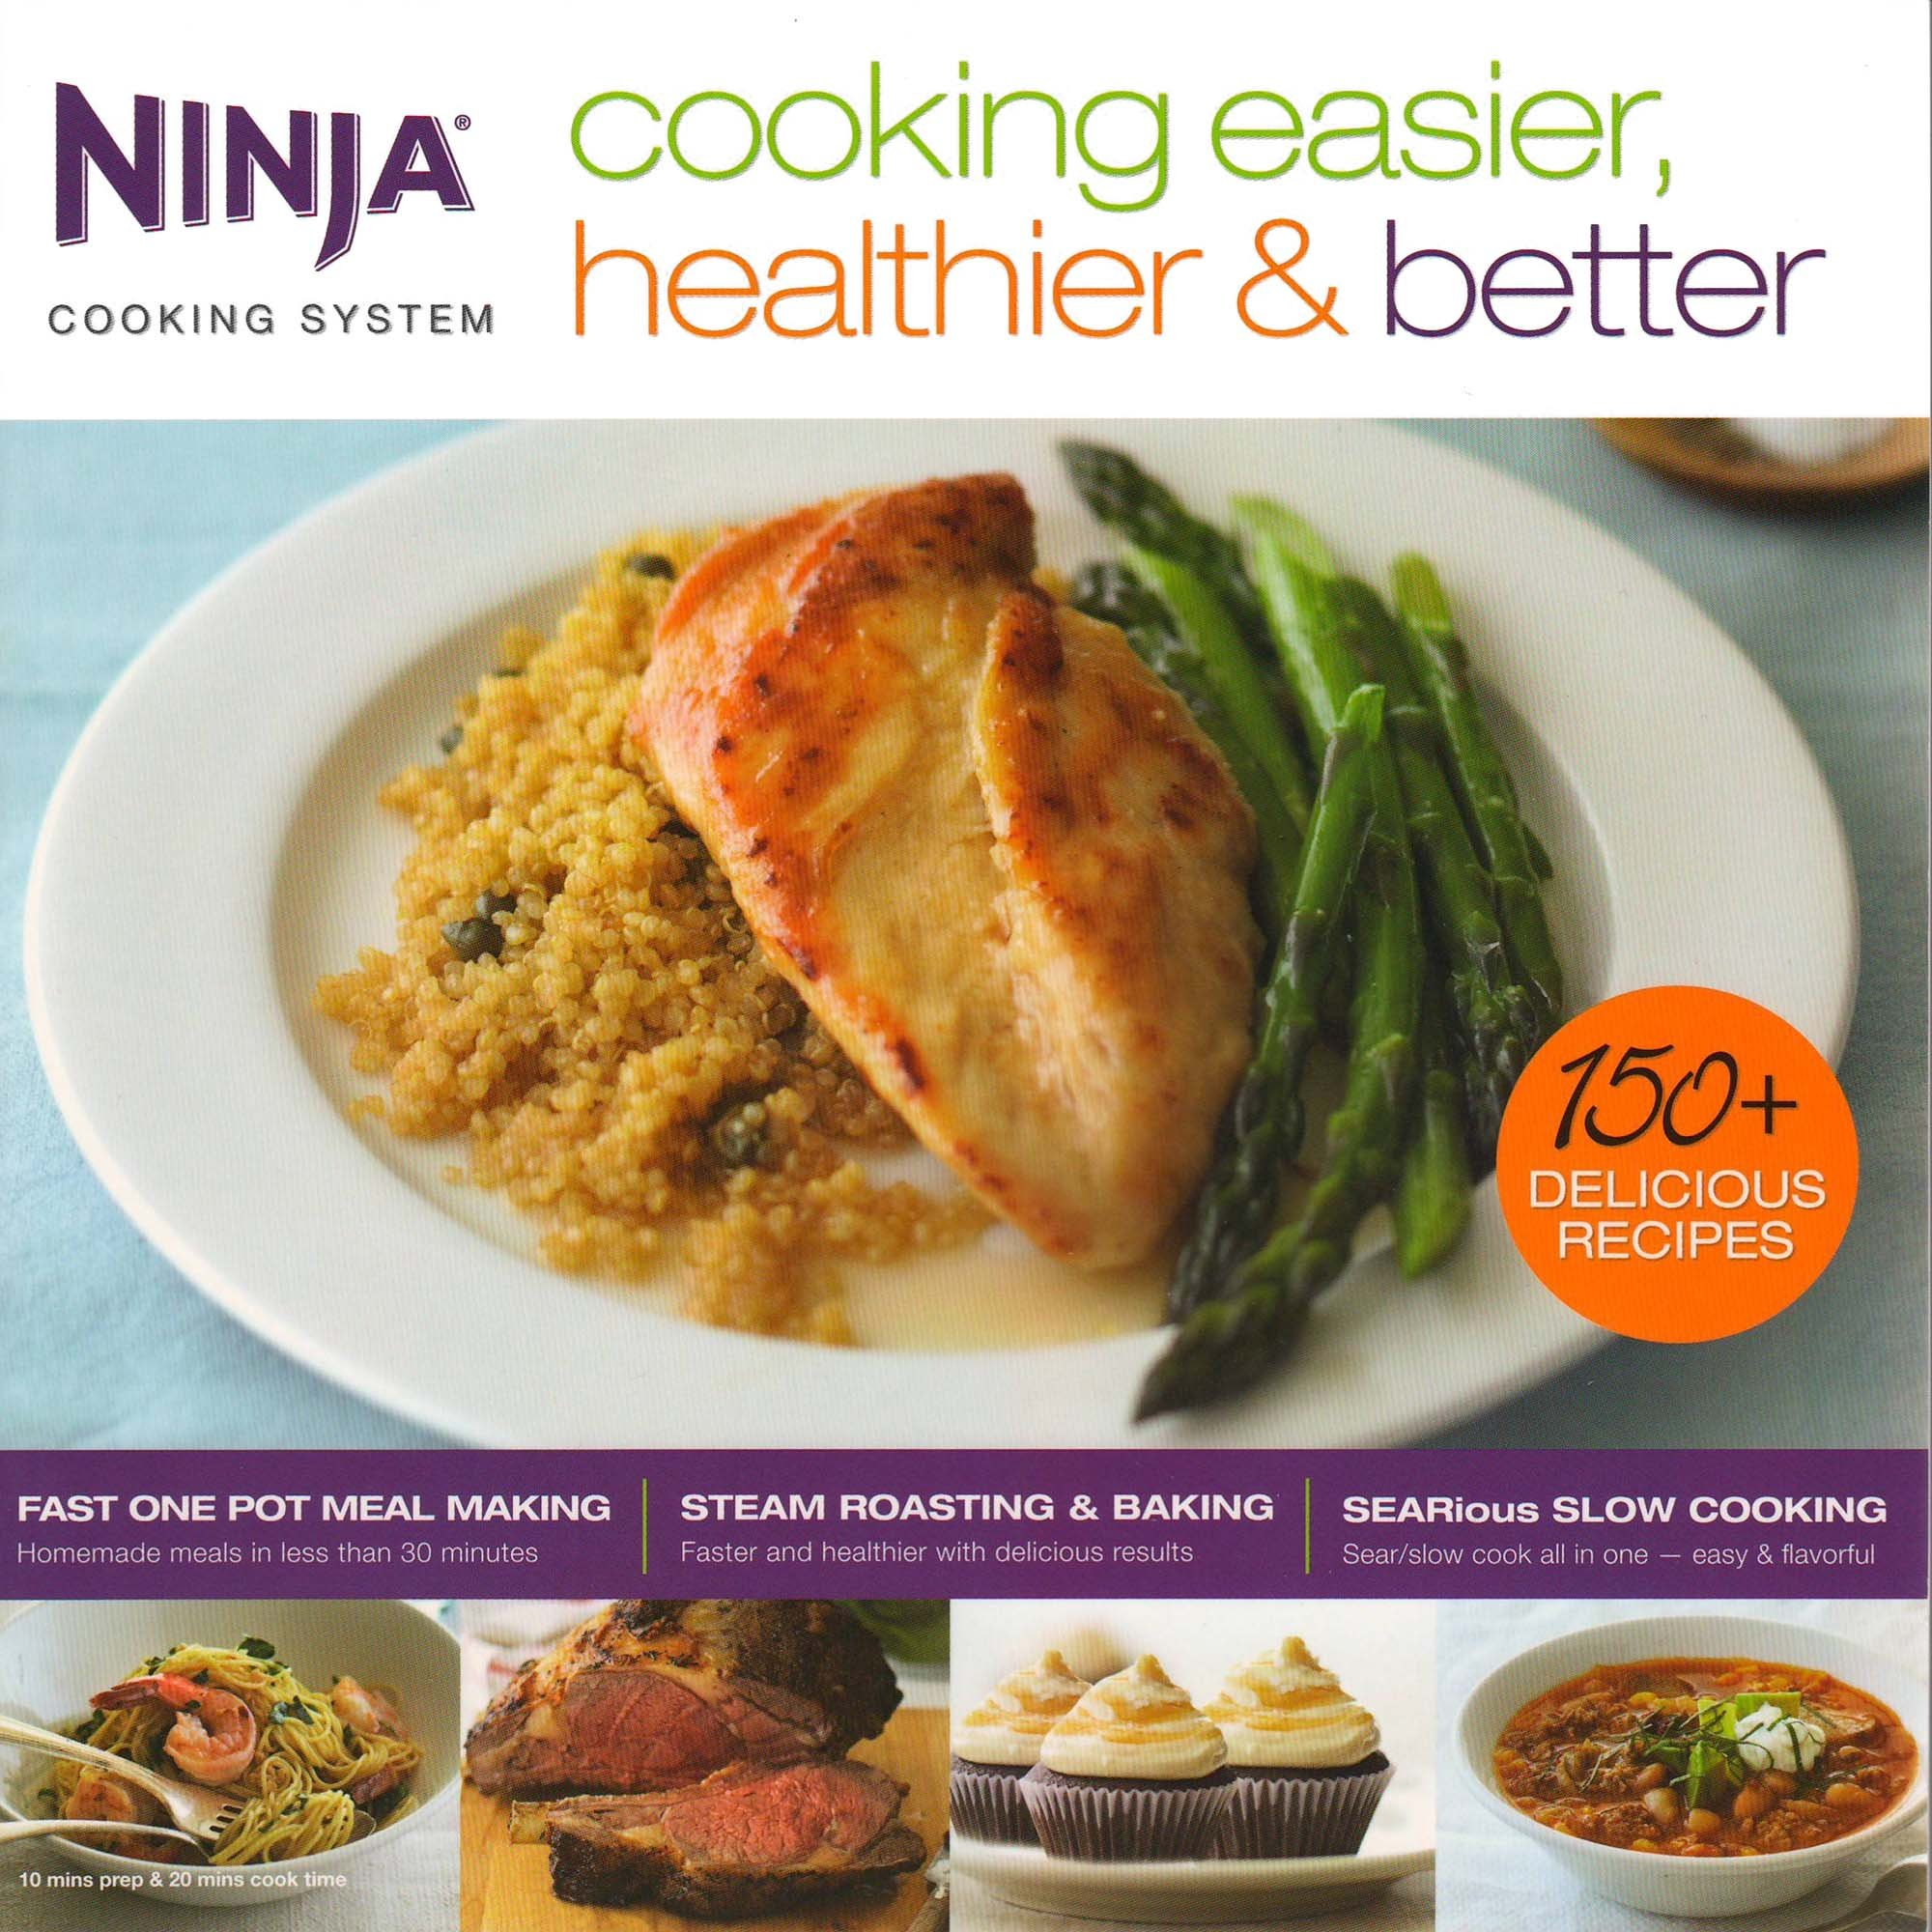 Ninja 6 Quart 3-In-1 Slow Cooker with Recipe Book (Certified Refurbished) by SharkNinja (Image #9)